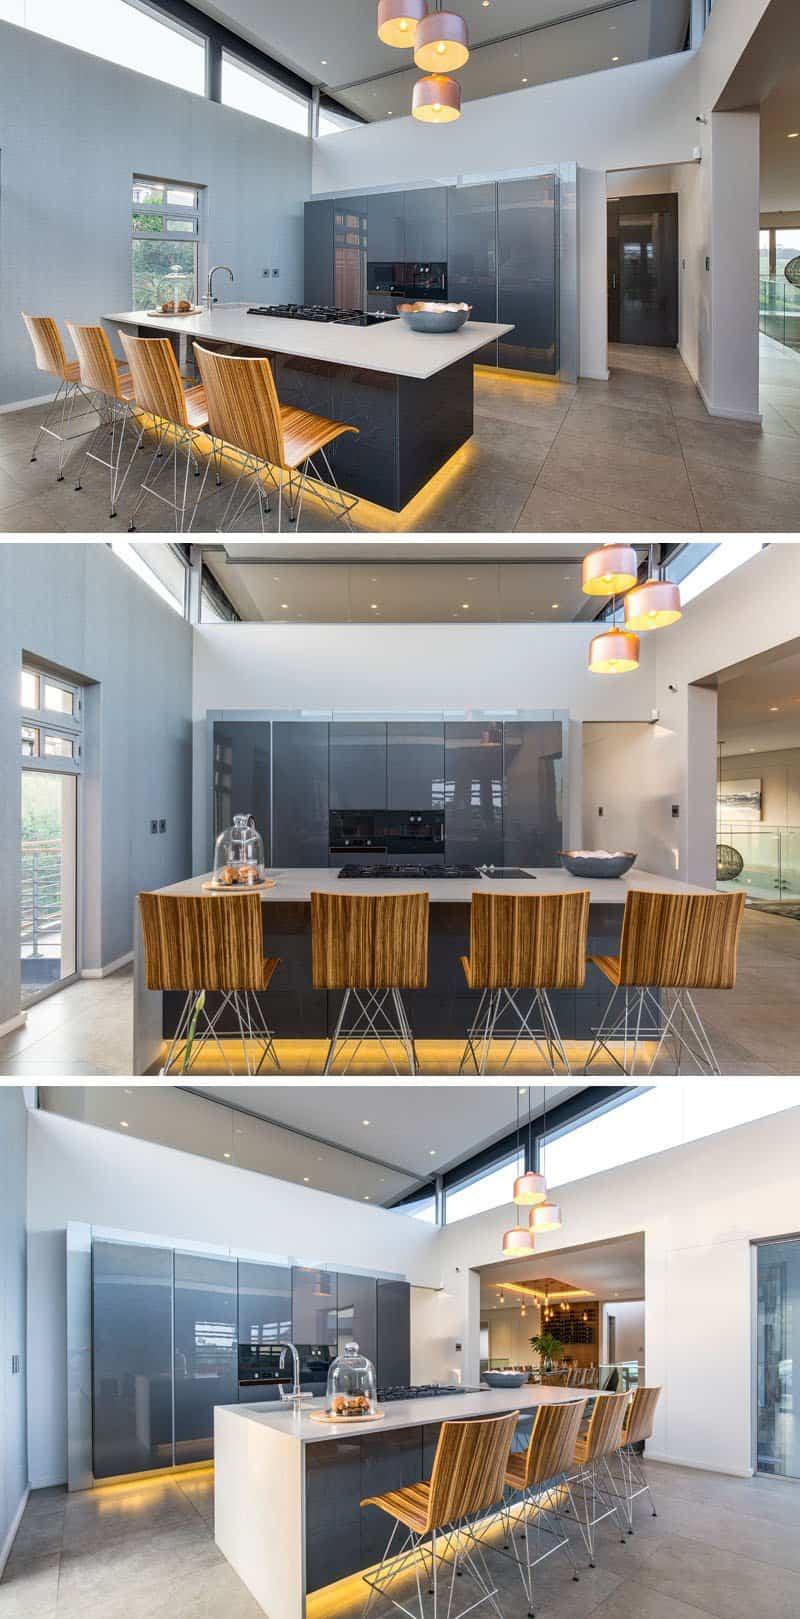 casa moderna alrededor de una piscina cubierta 4